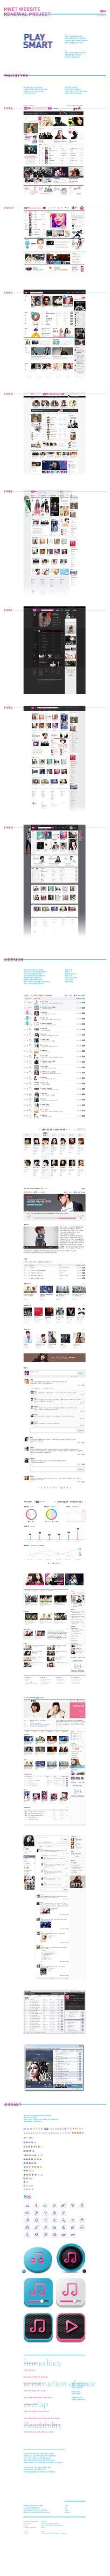 mnet website by PlusX  / UI Design